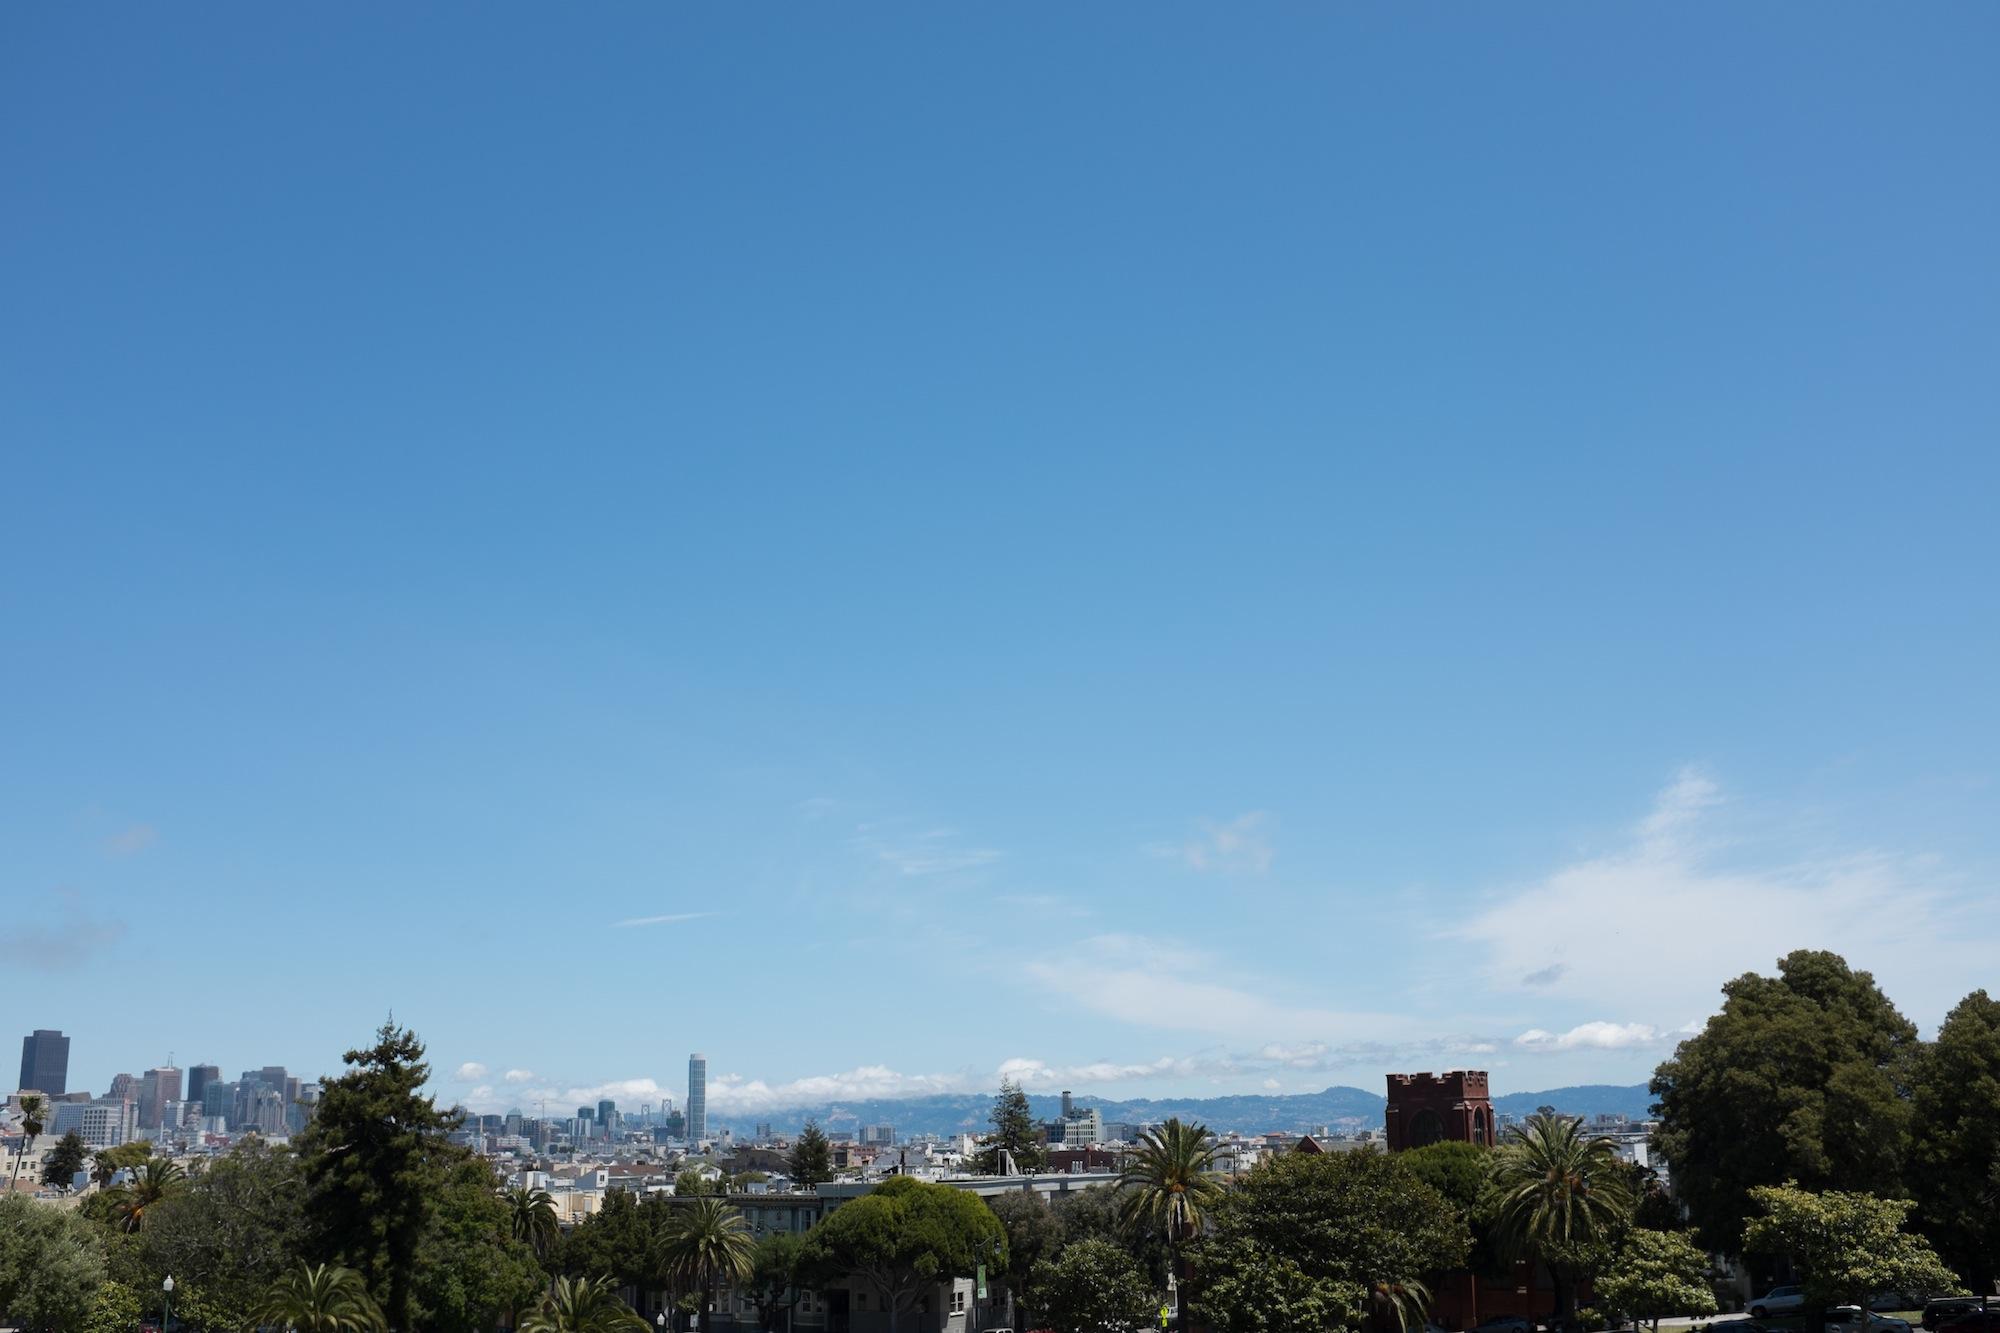 Fuji X100S - Distorted SF Skyline